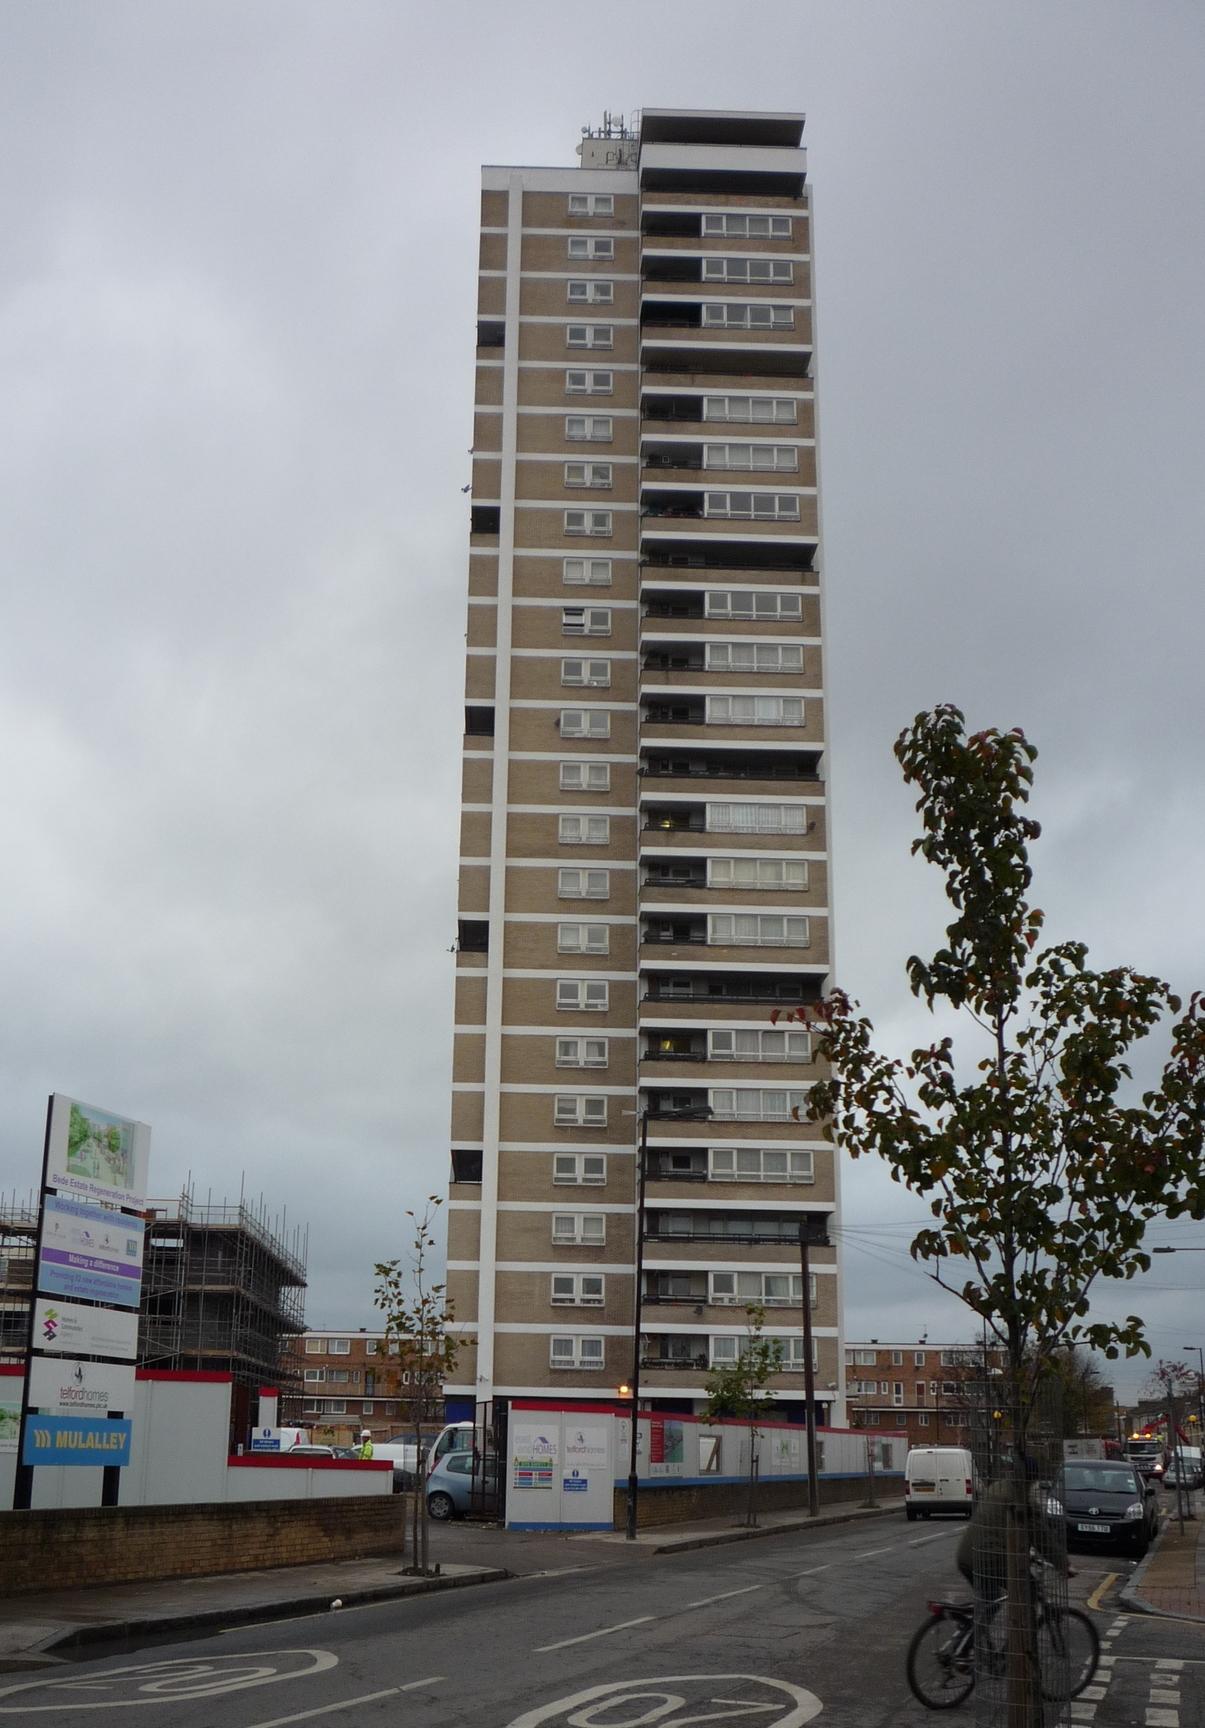 Housing Estate in Hackney.JPG